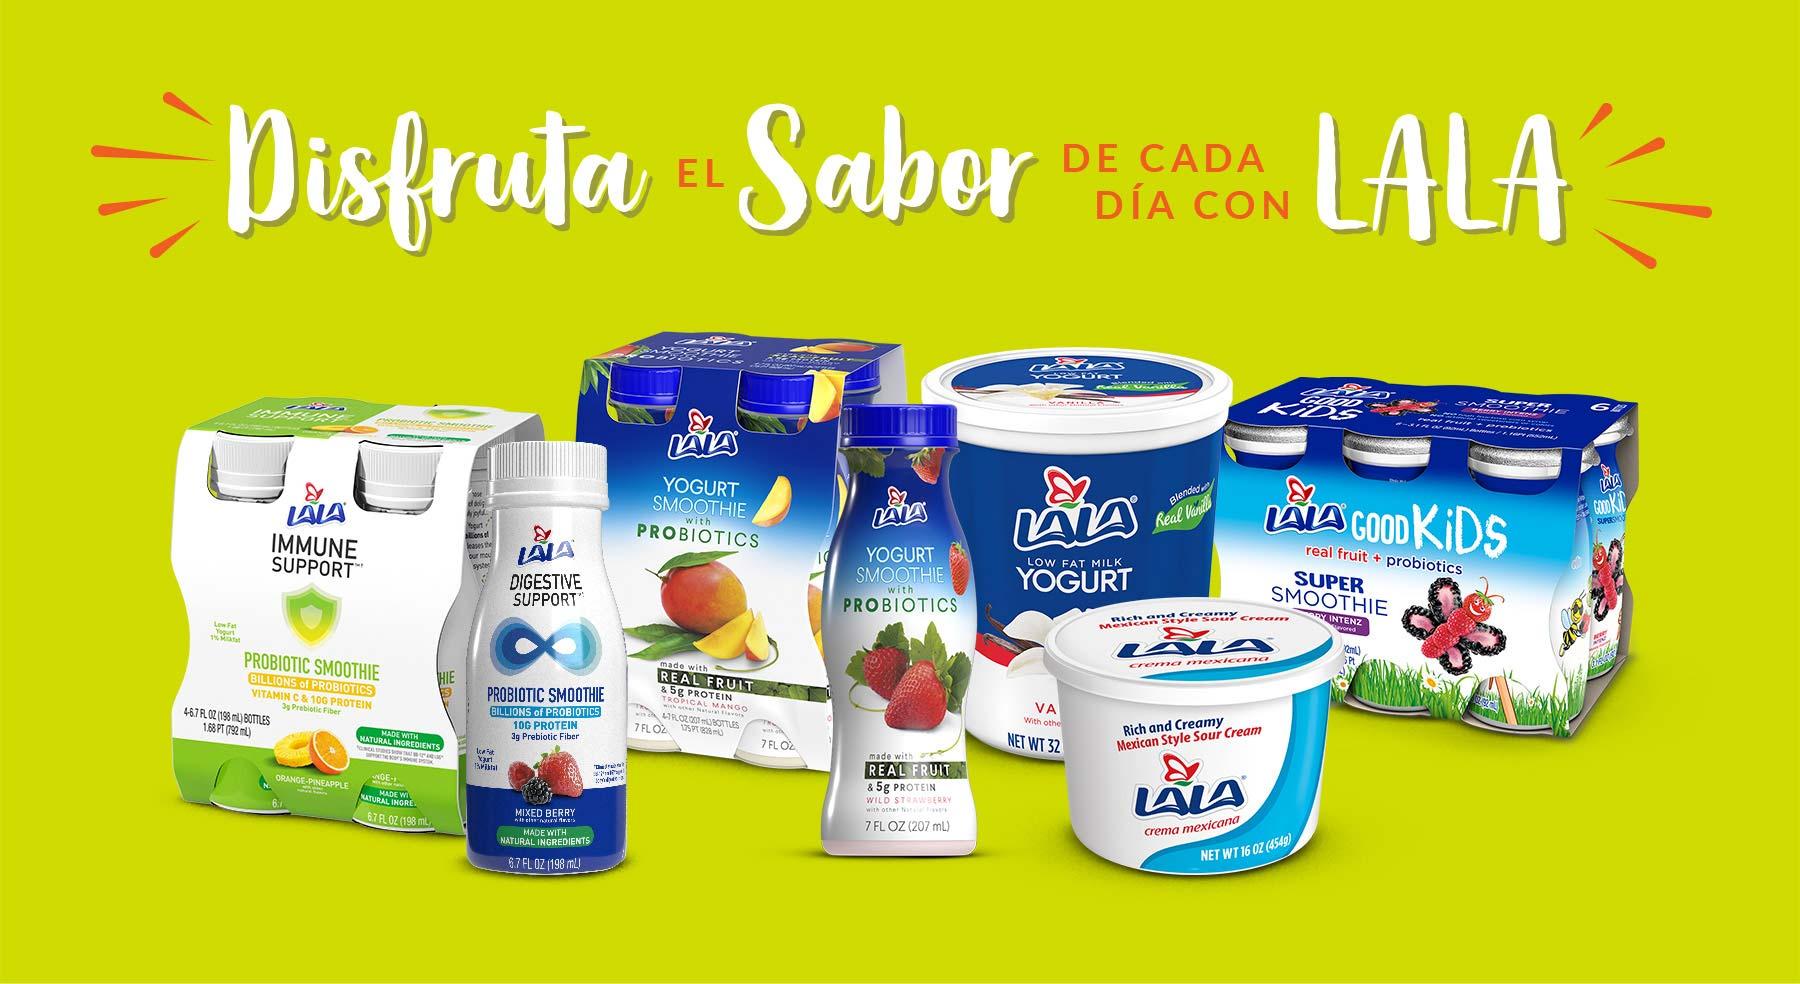 LALA Foods